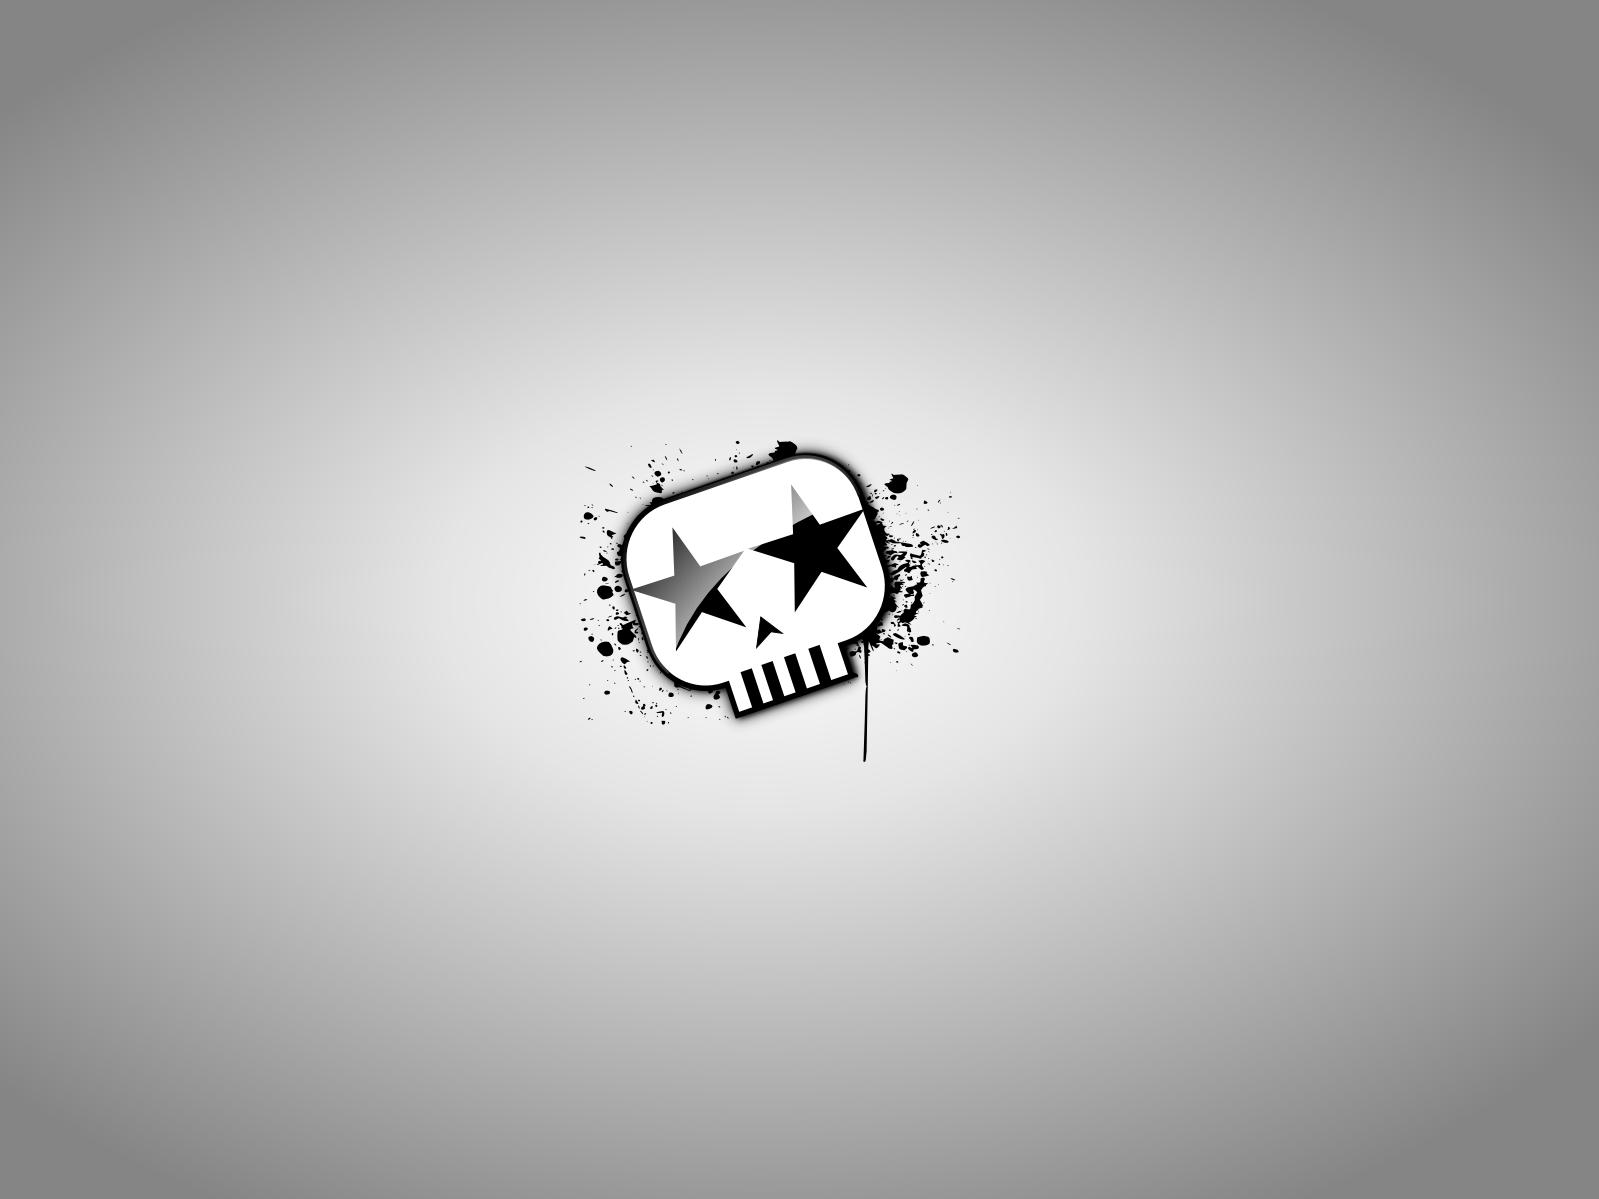 skull breaker by bmgreatness